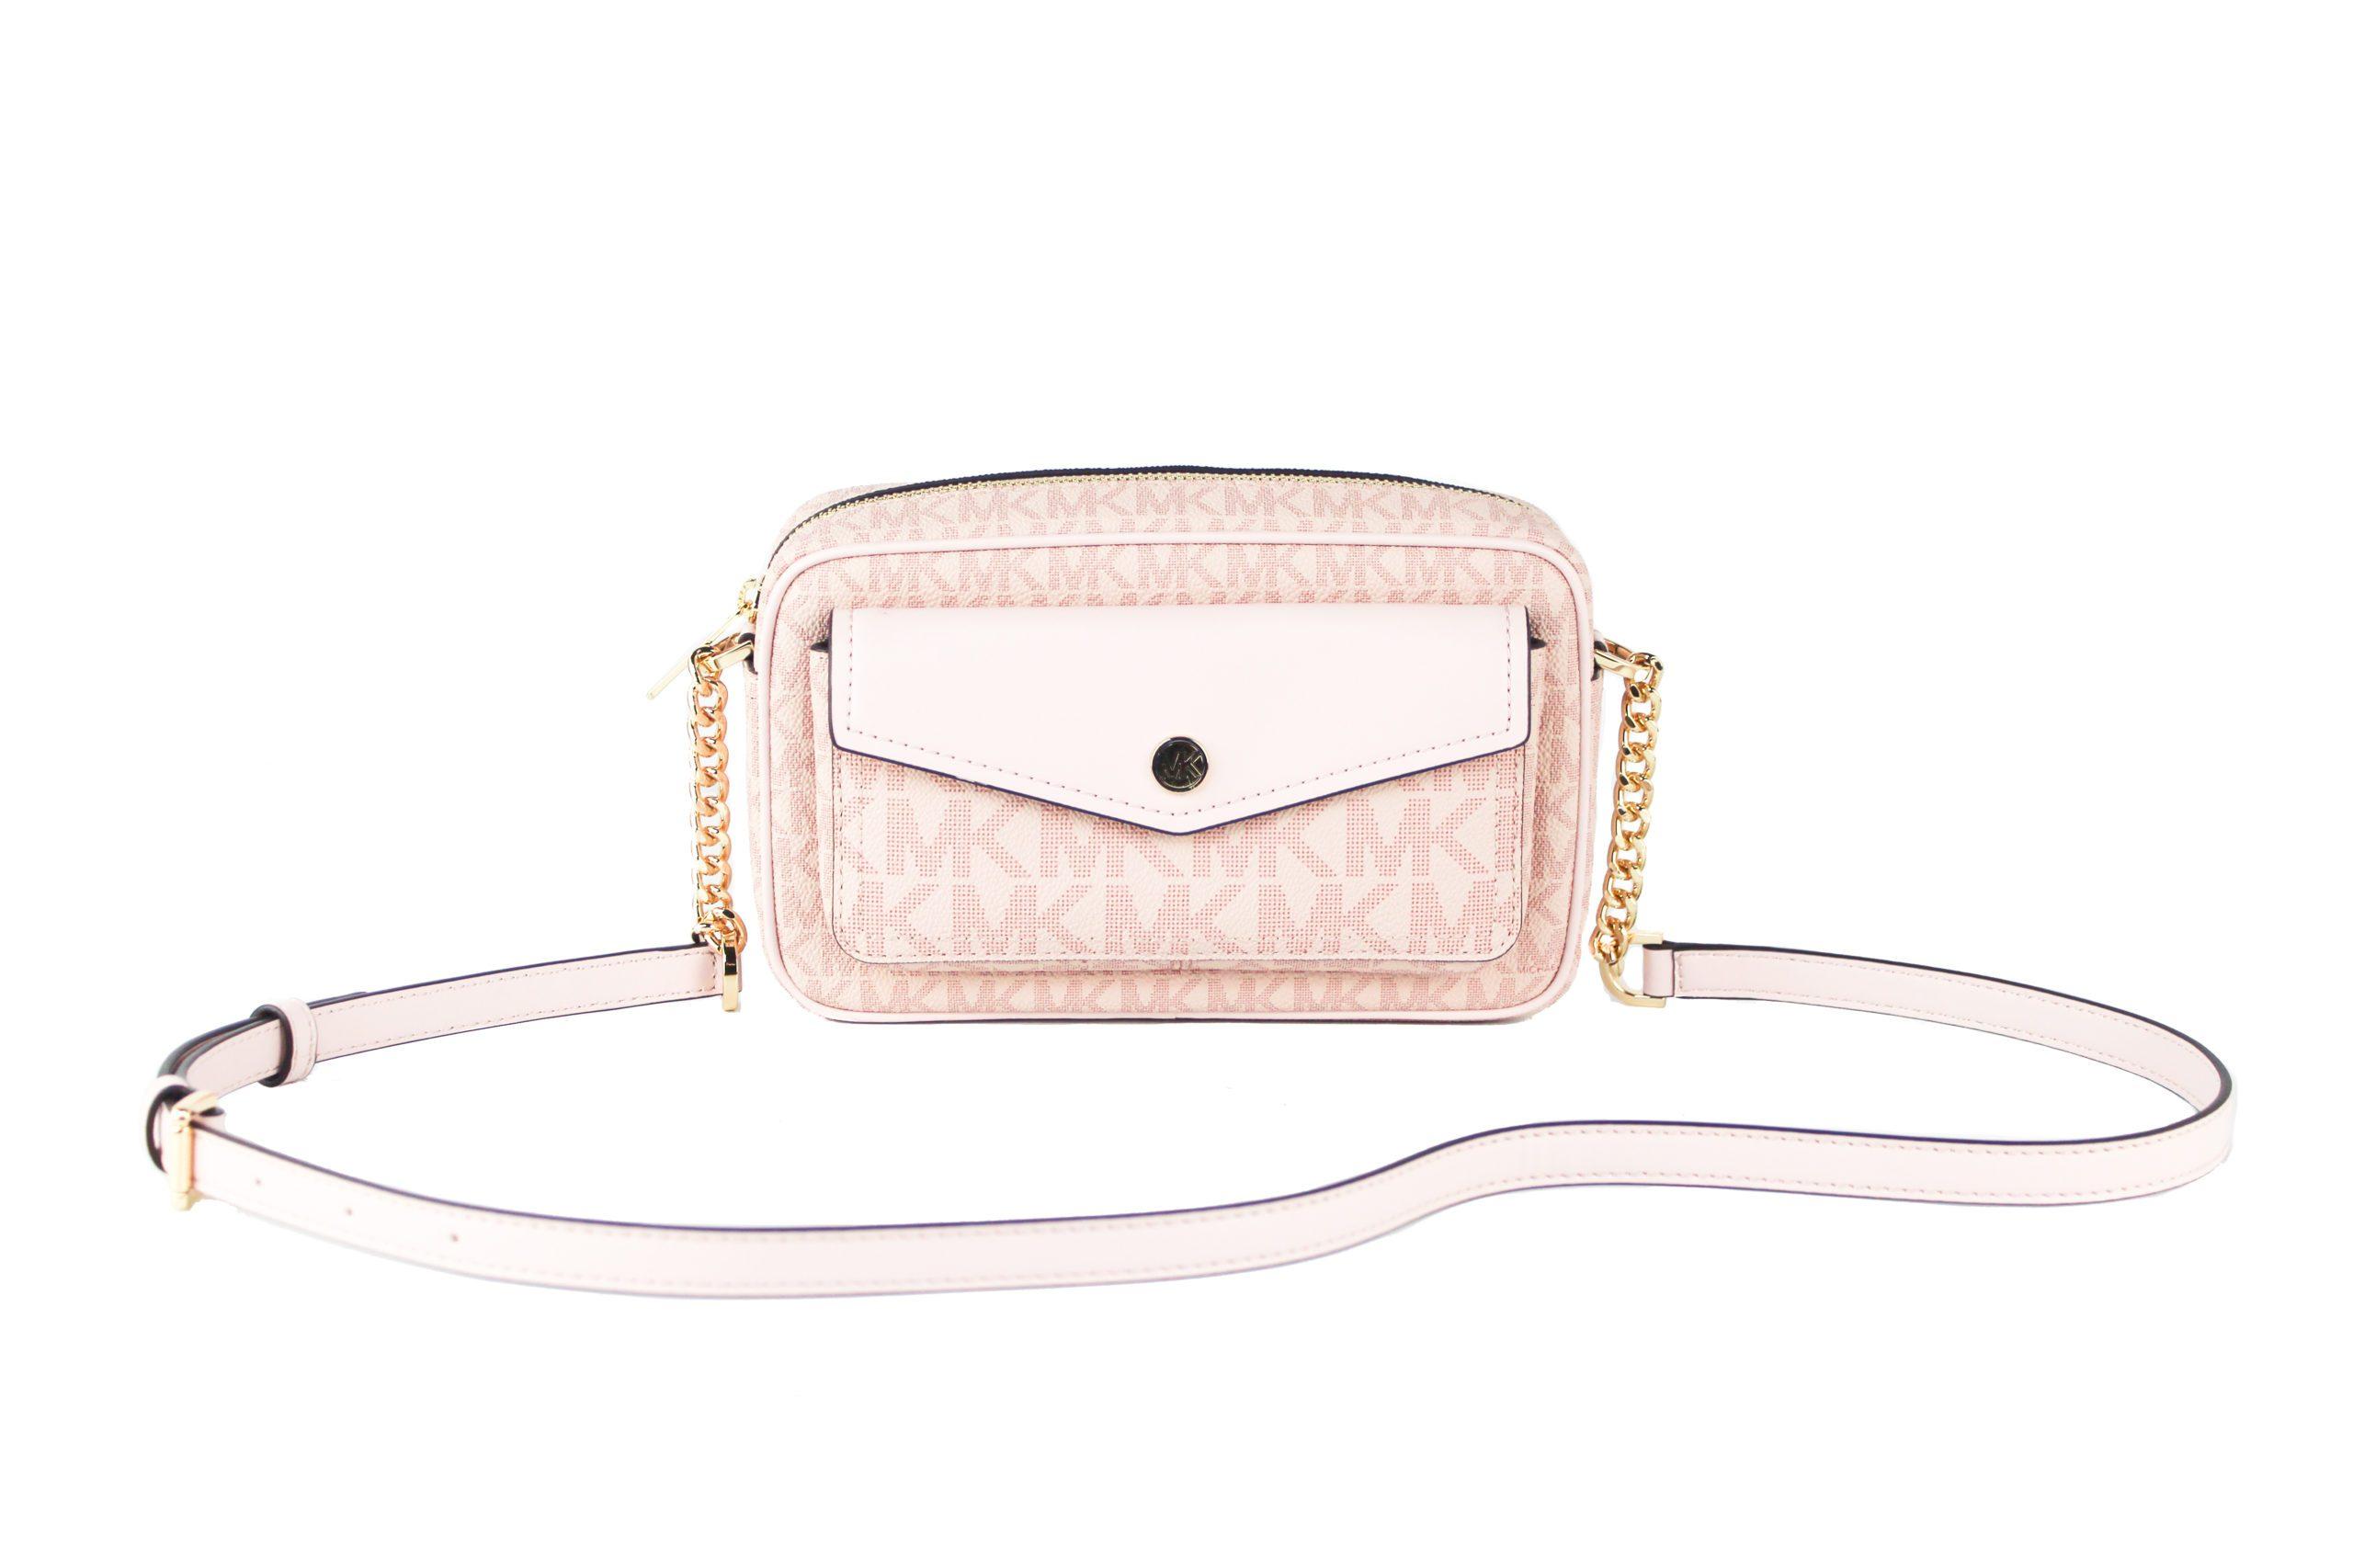 Michael Kors Women's Jet Set Crossbody Bag Pink 701898